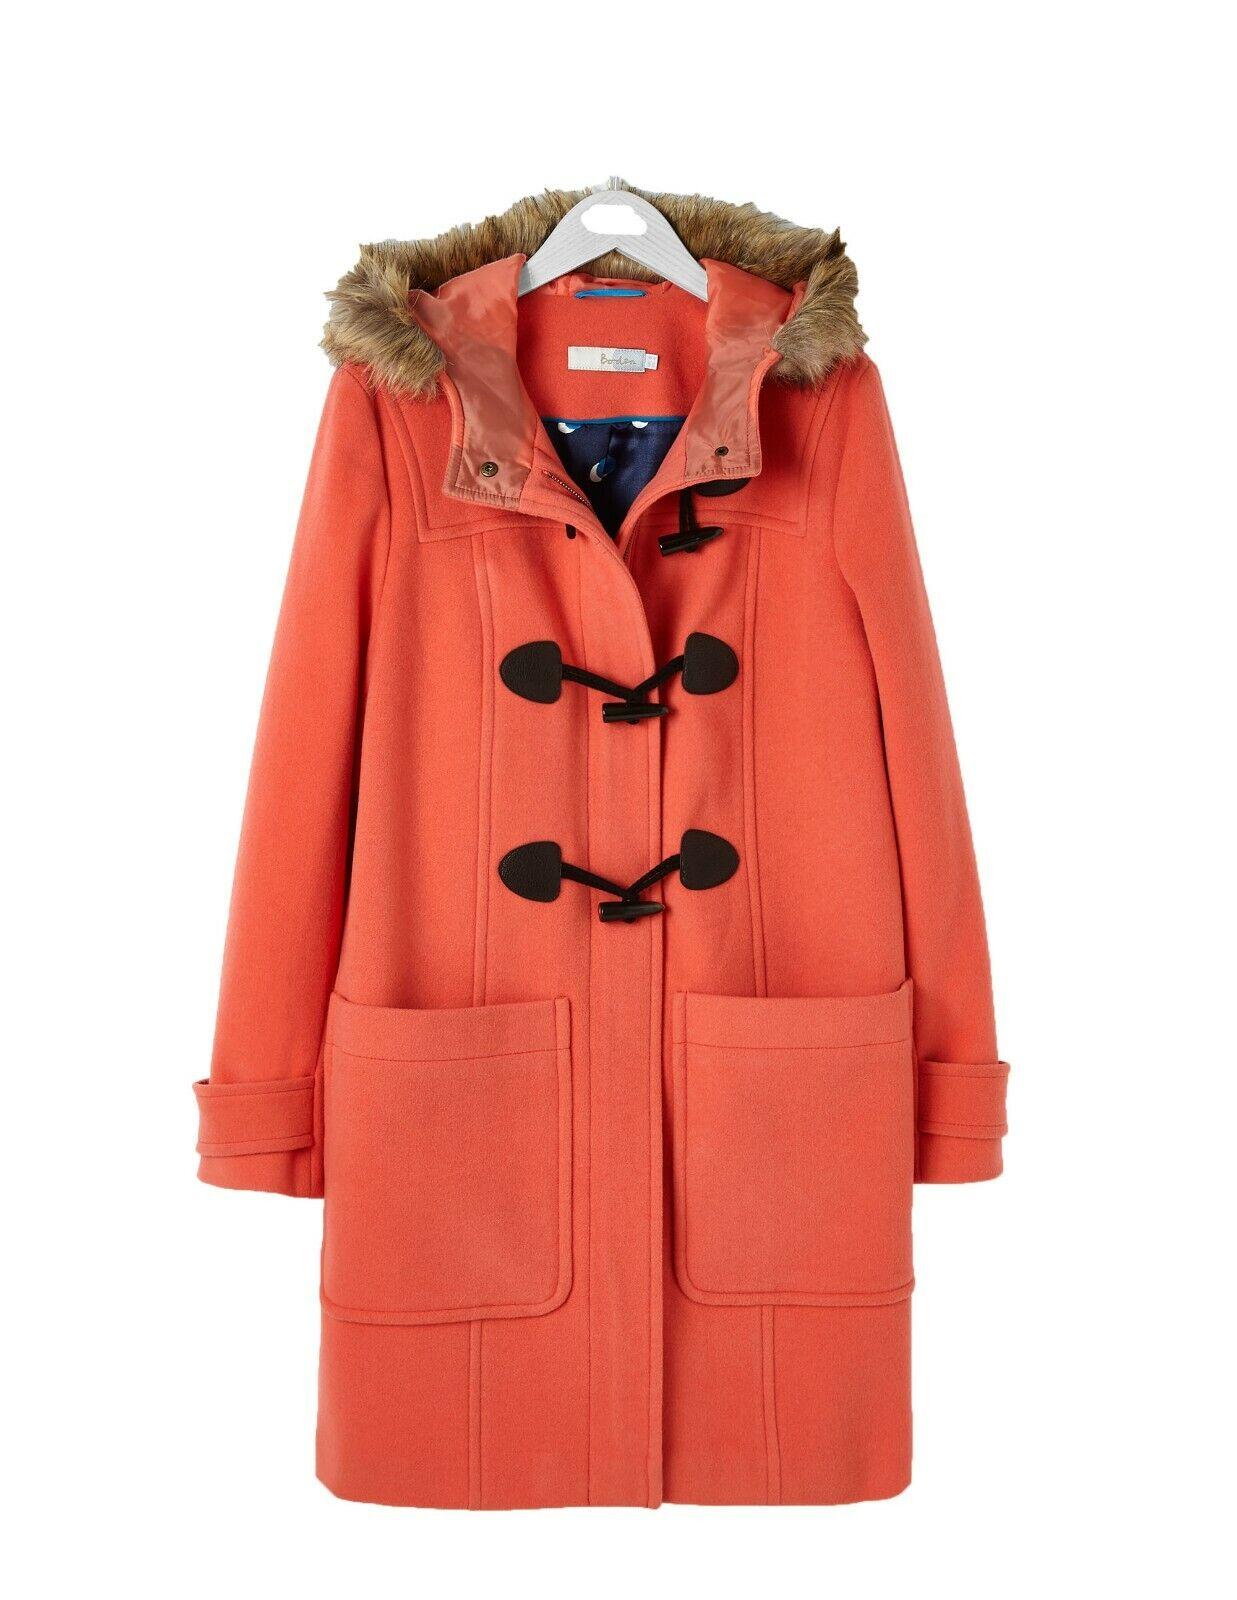 Ex Boden Orange Wool Duffle Coat Größe 16